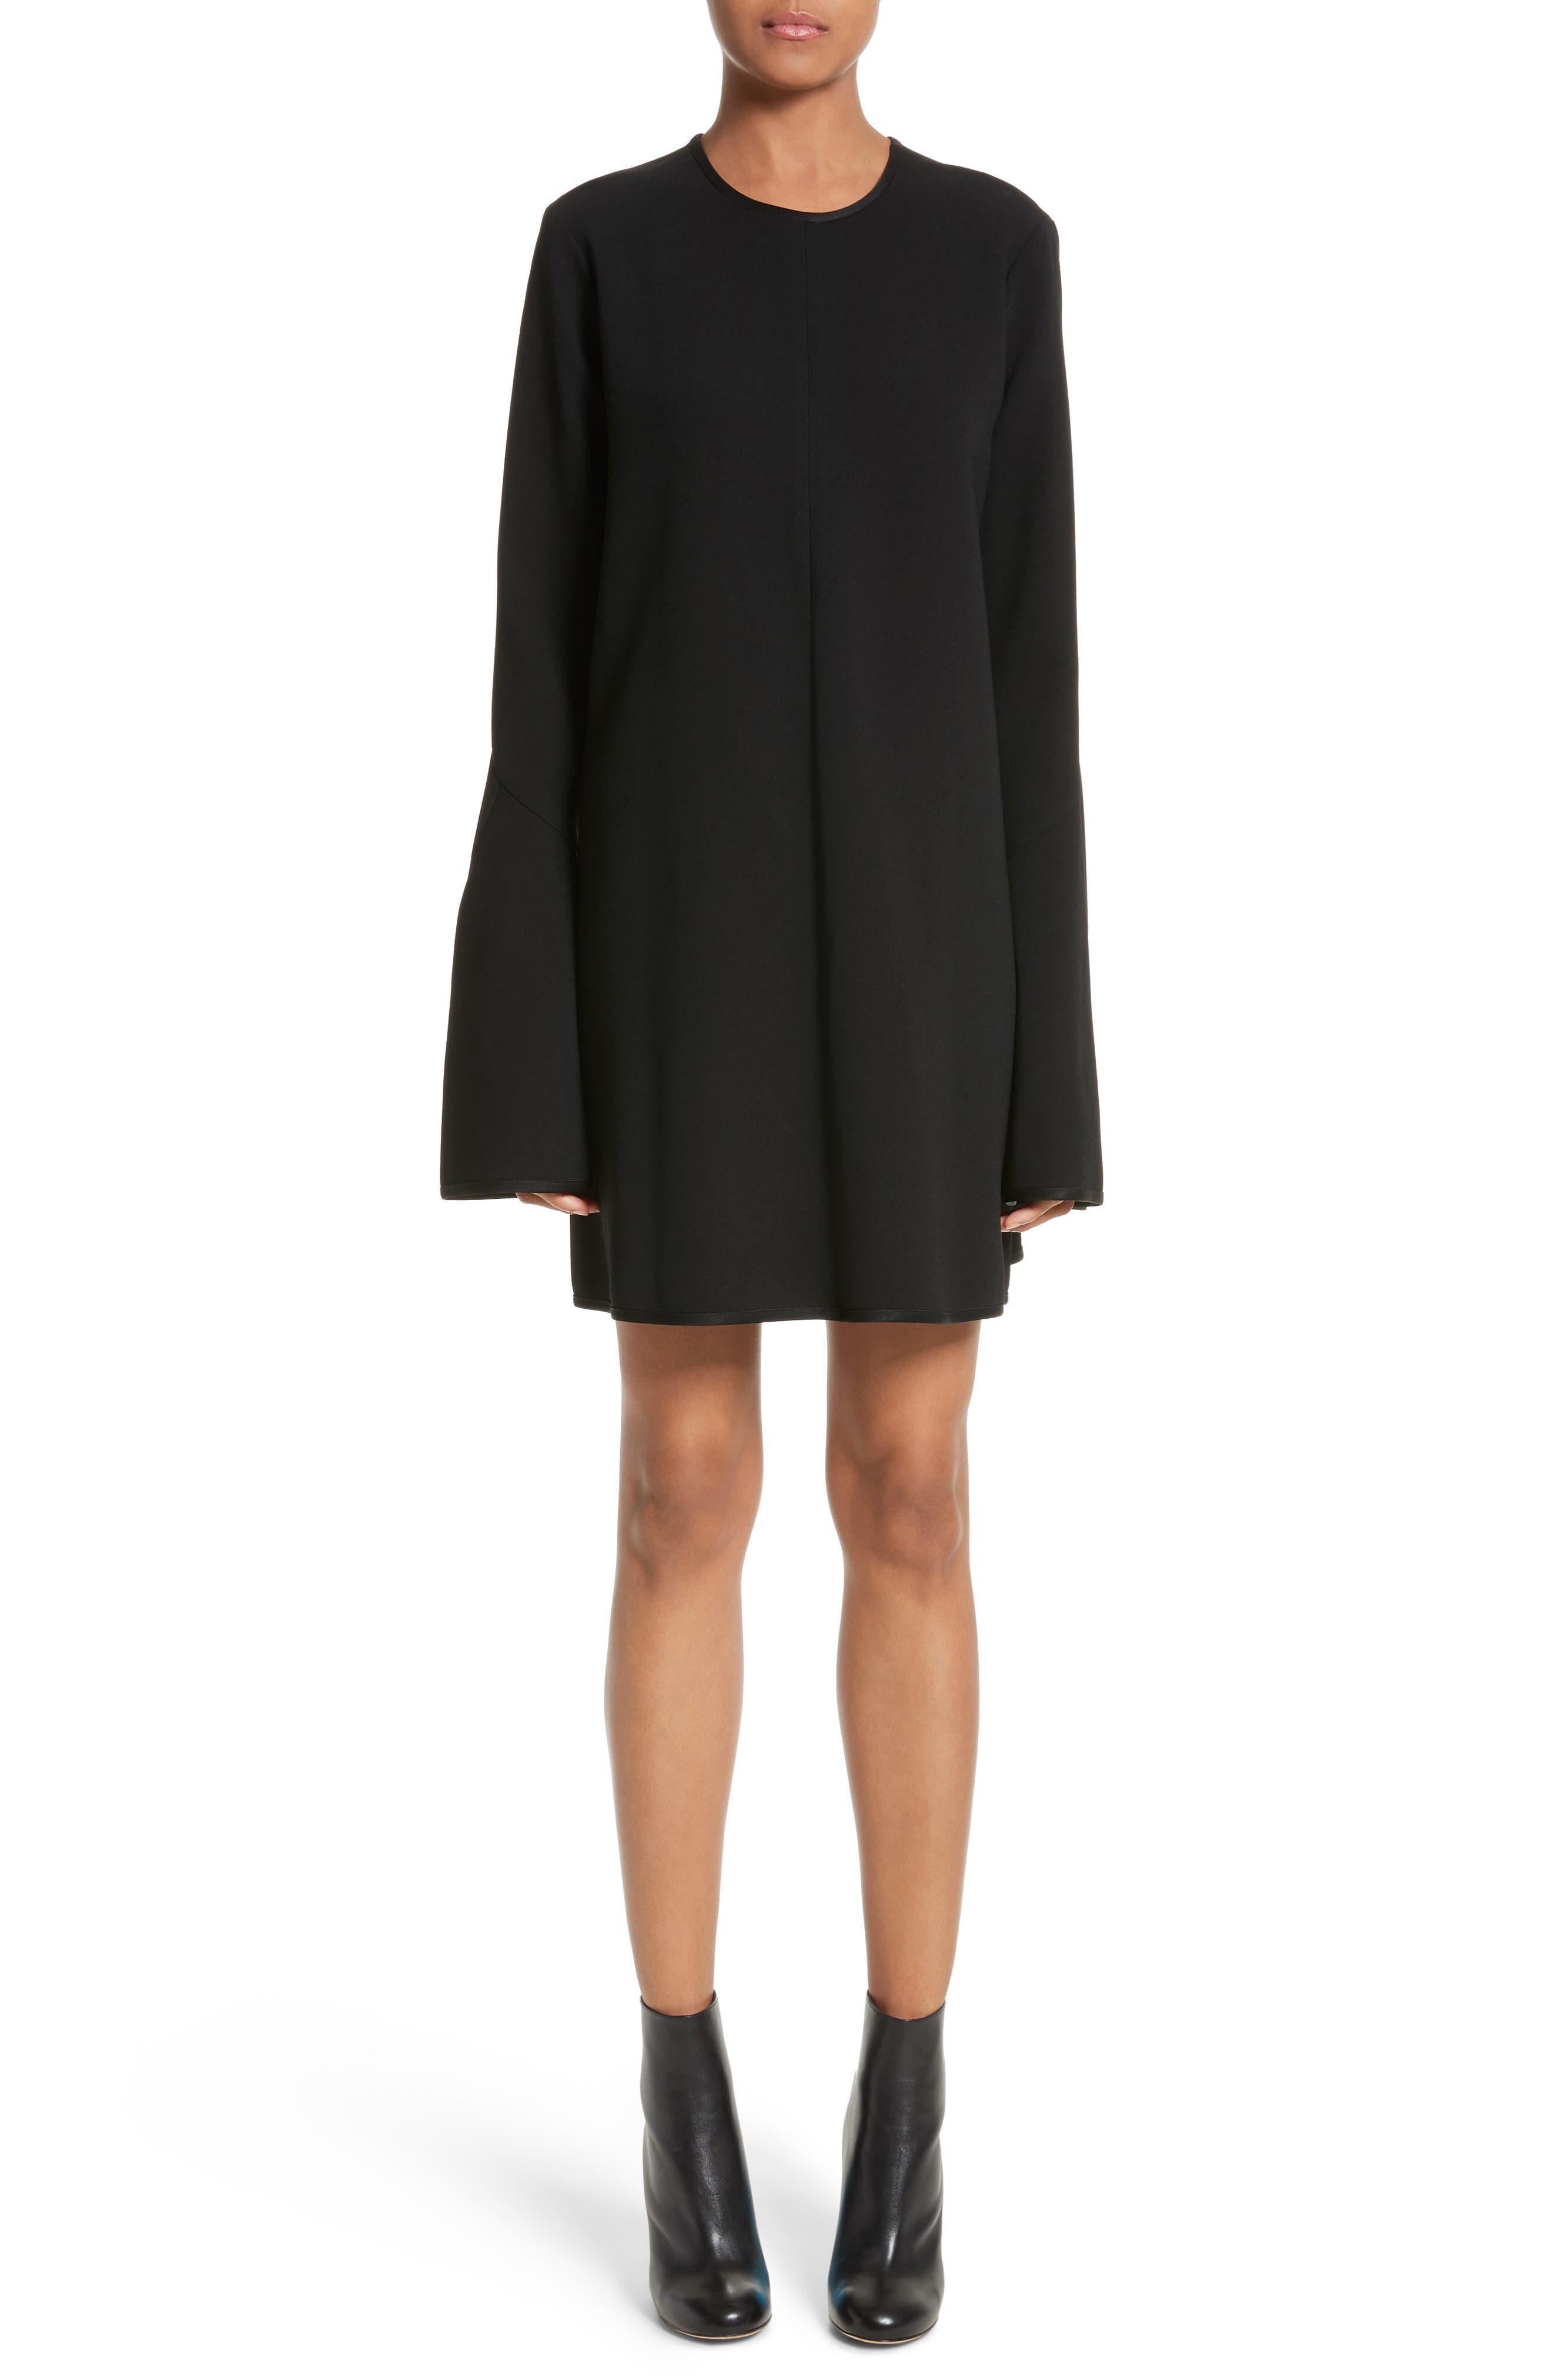 Preacher Flare Sleeve Minidress,                             Main thumbnail 1, color,                             001